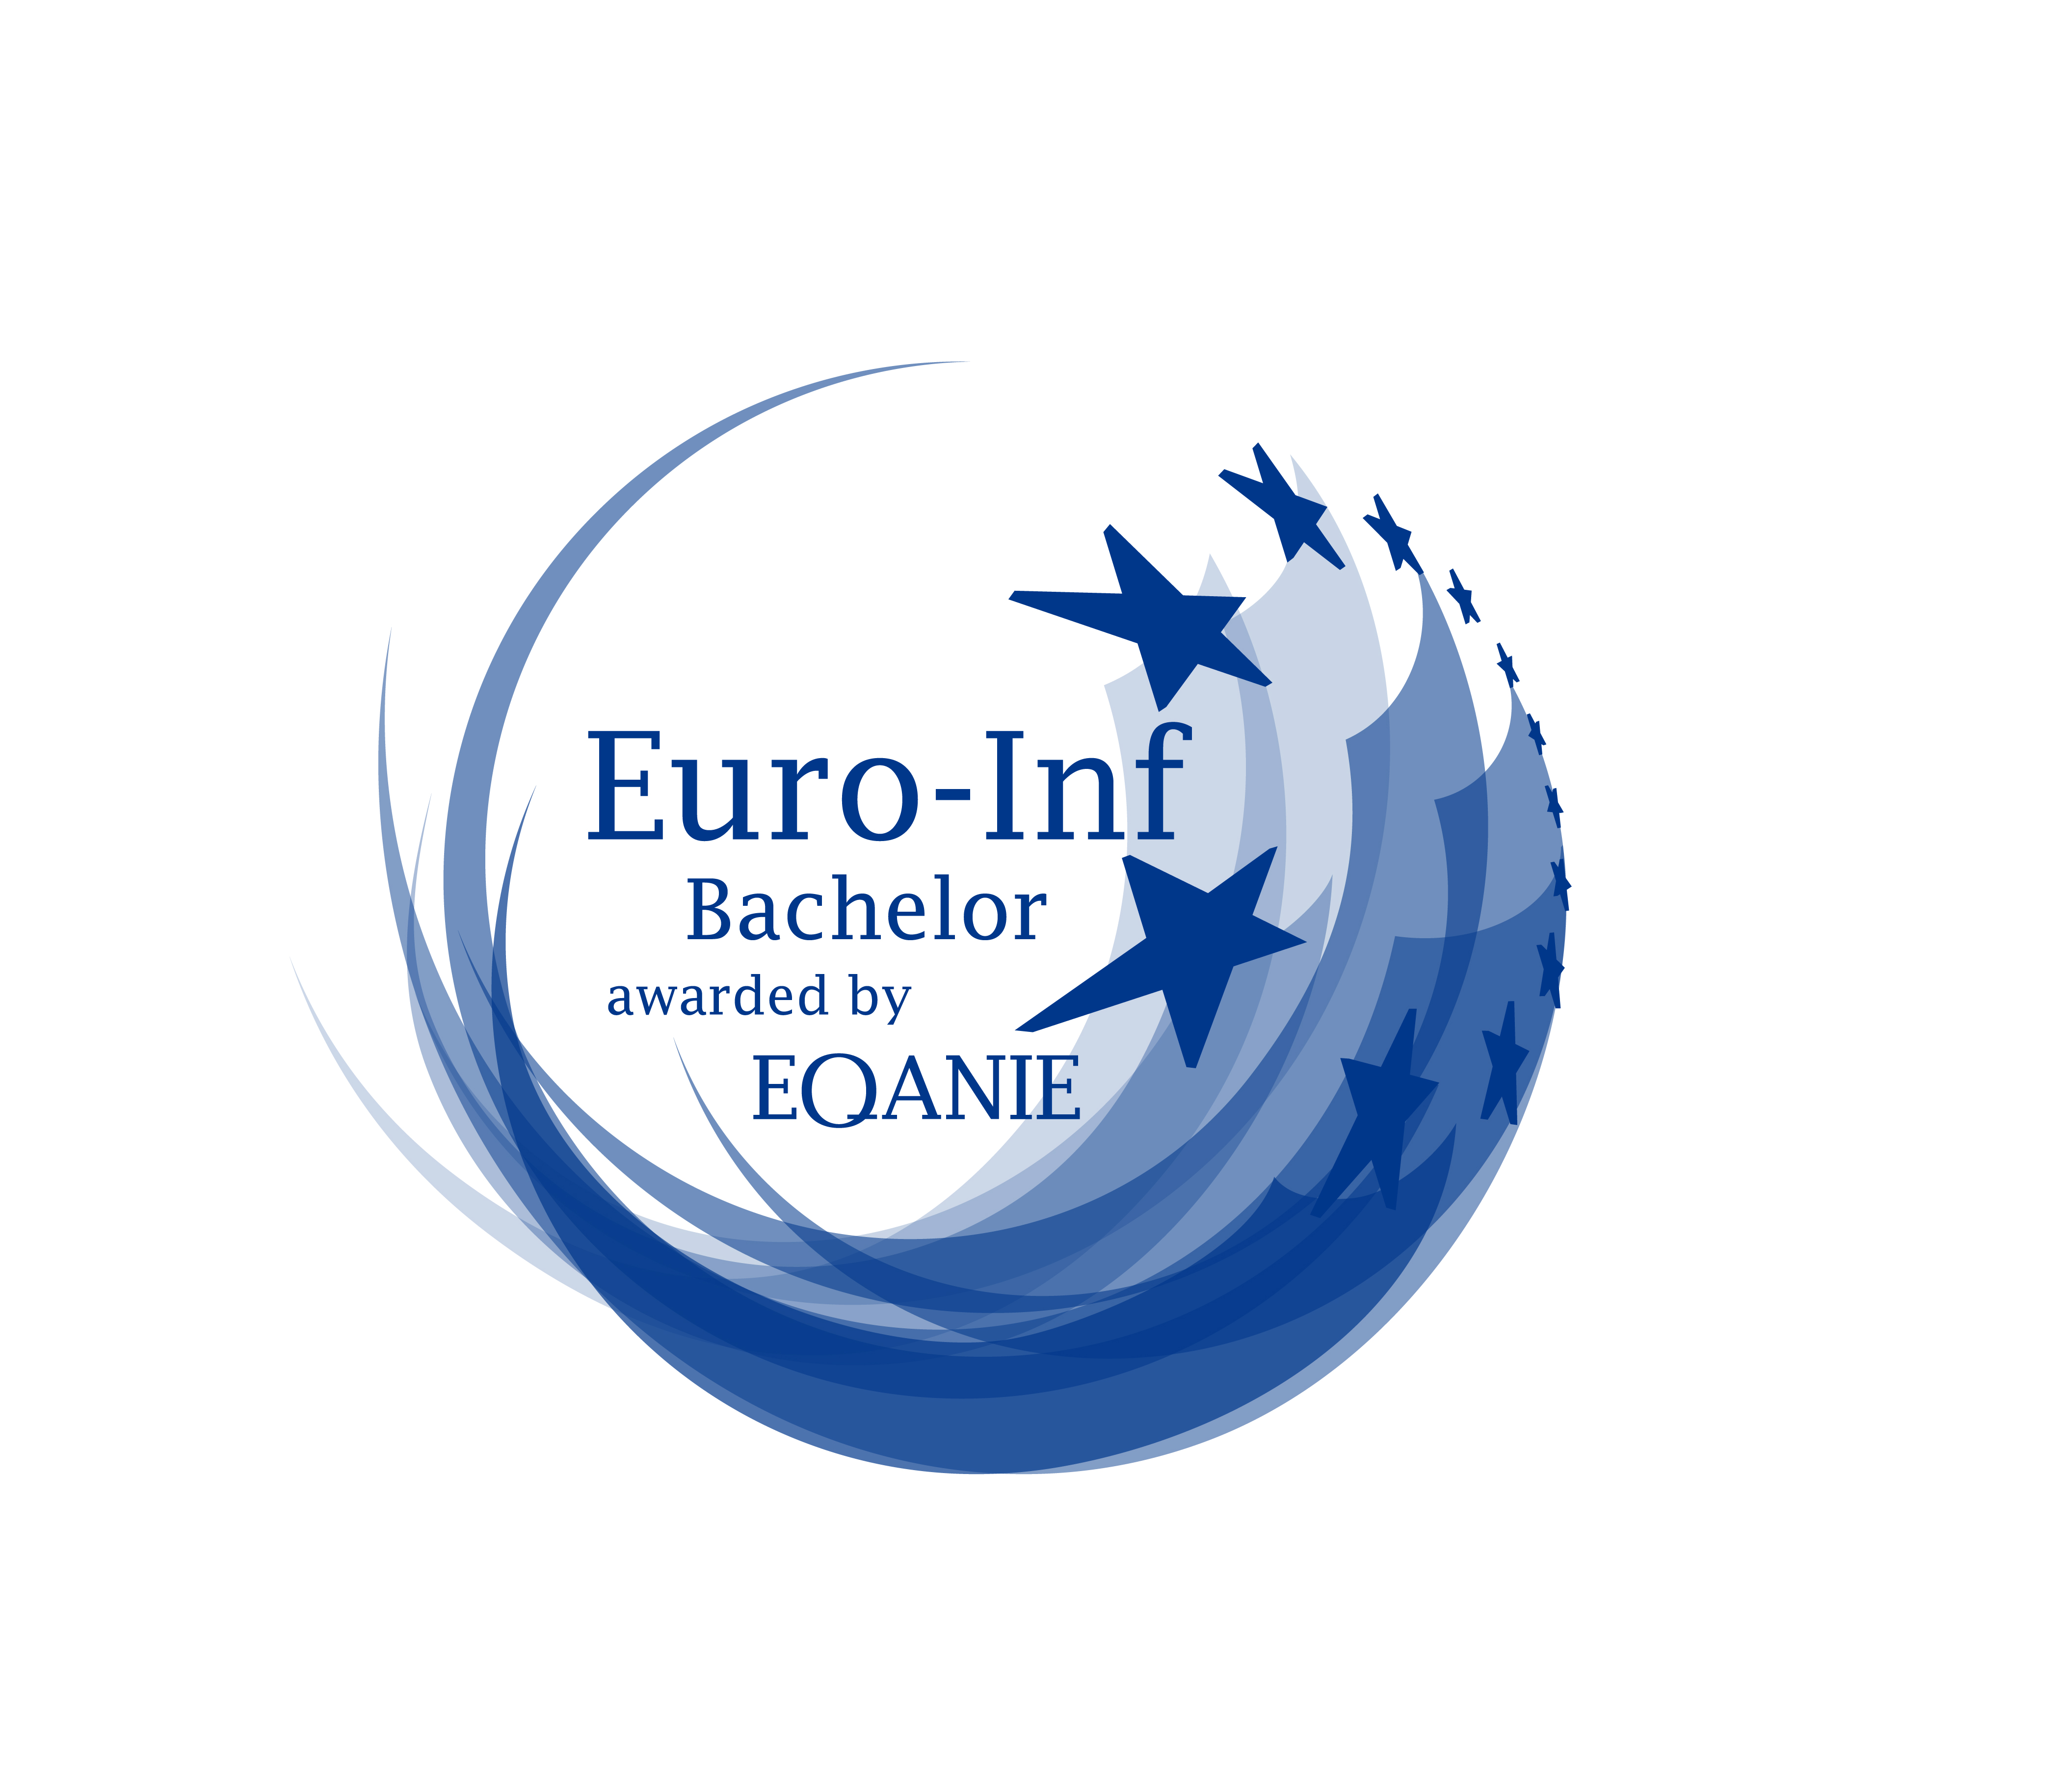 Segell EURO-INF d'ANECA